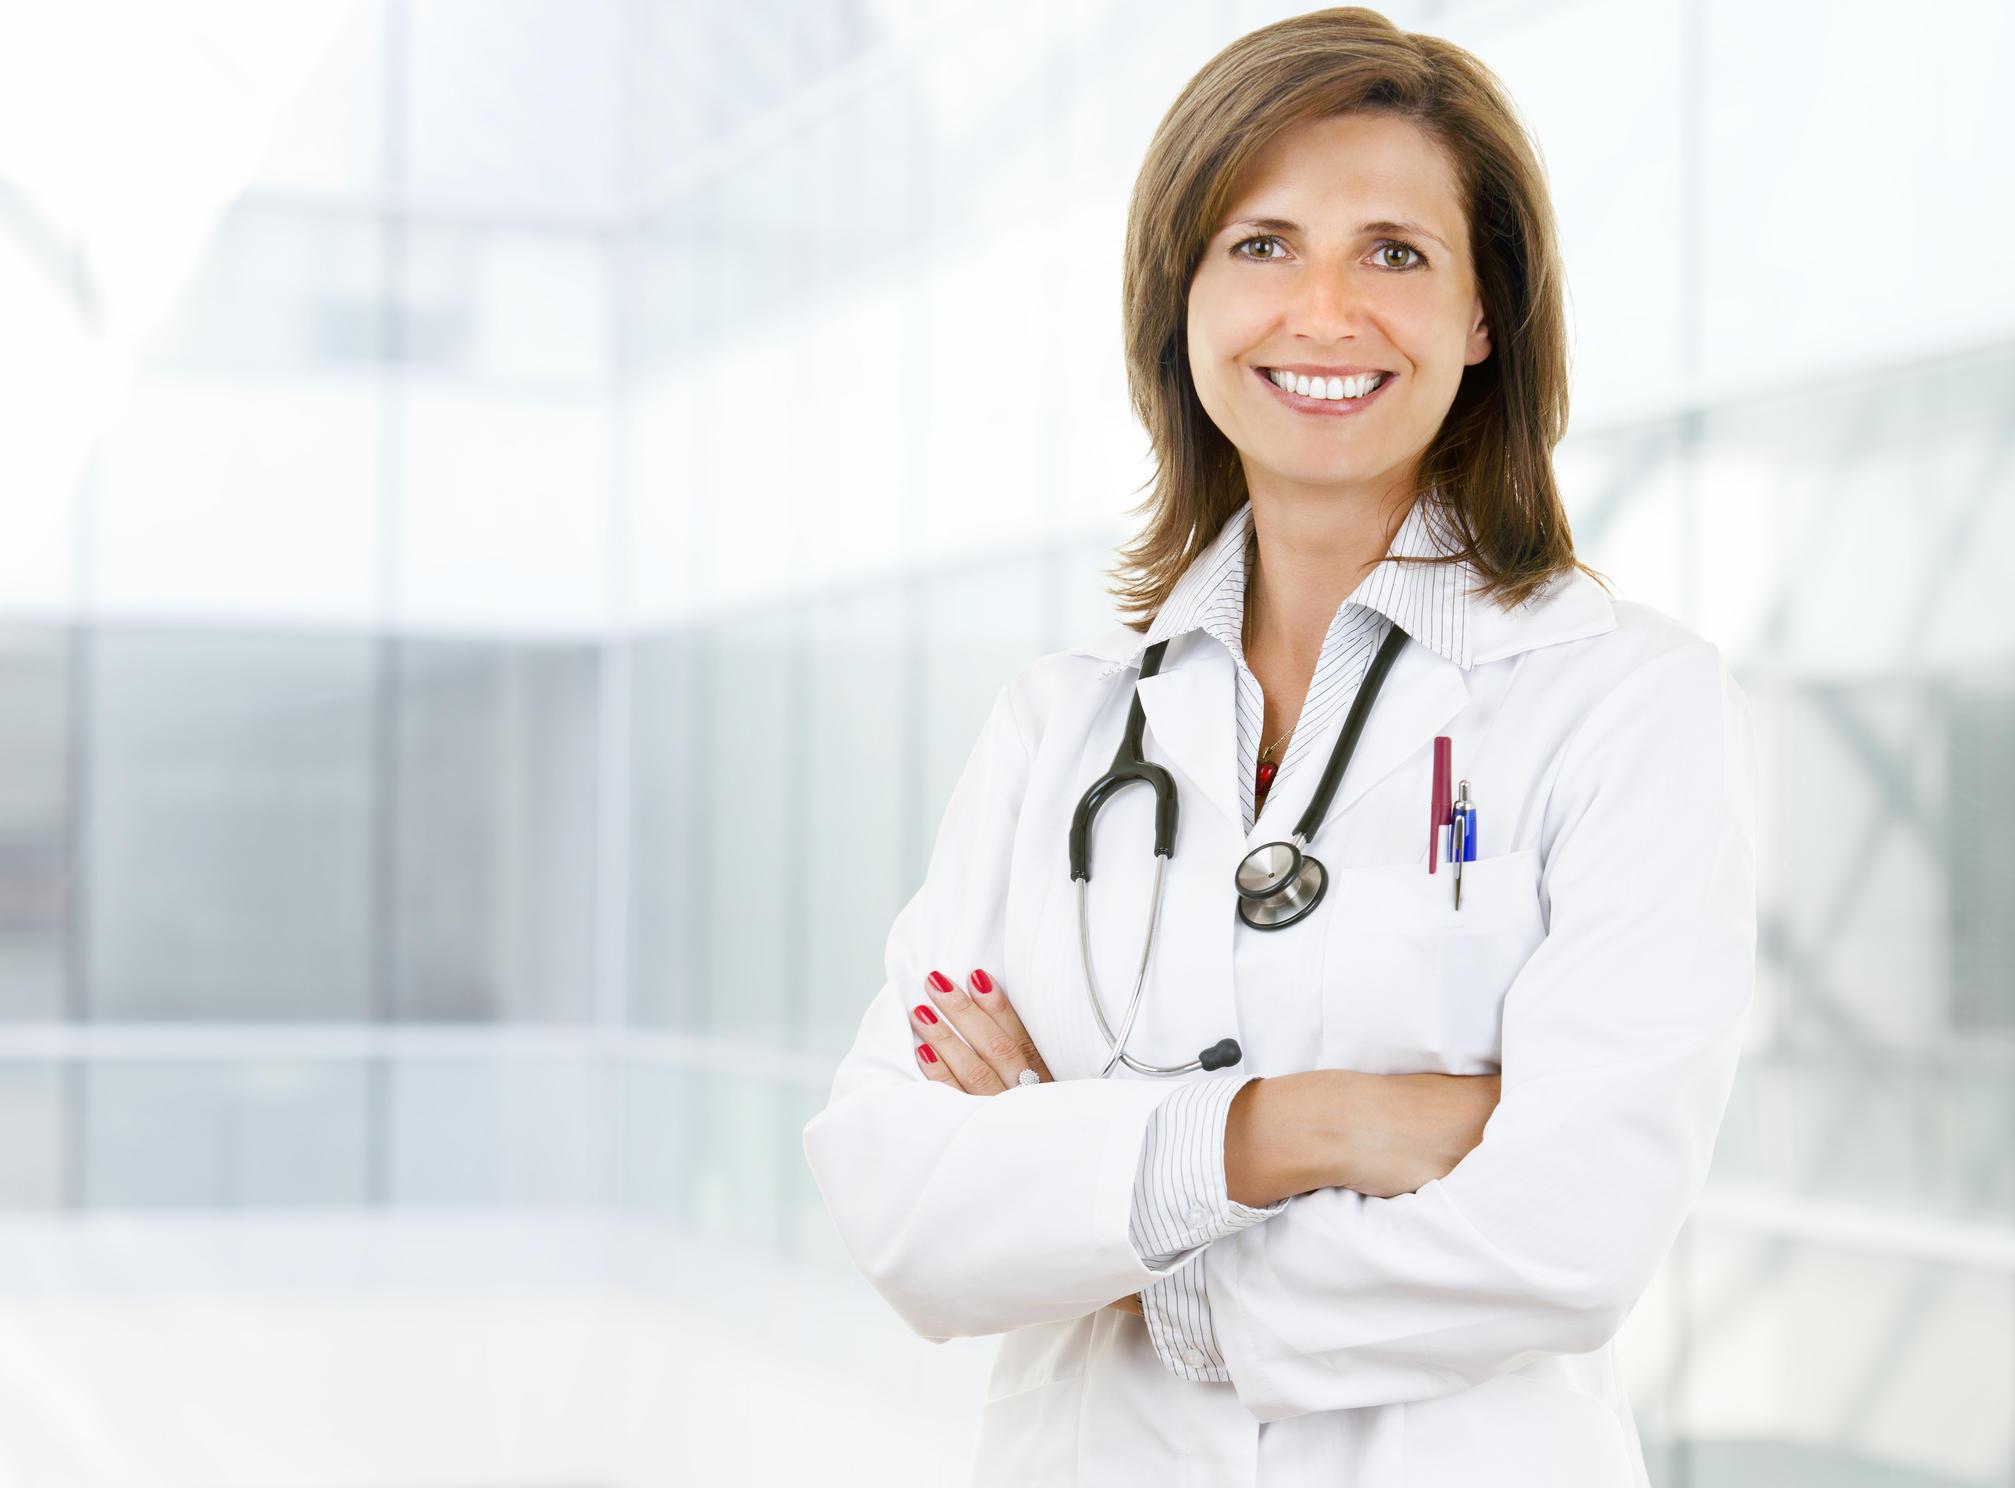 Dr. Petra Neumeier